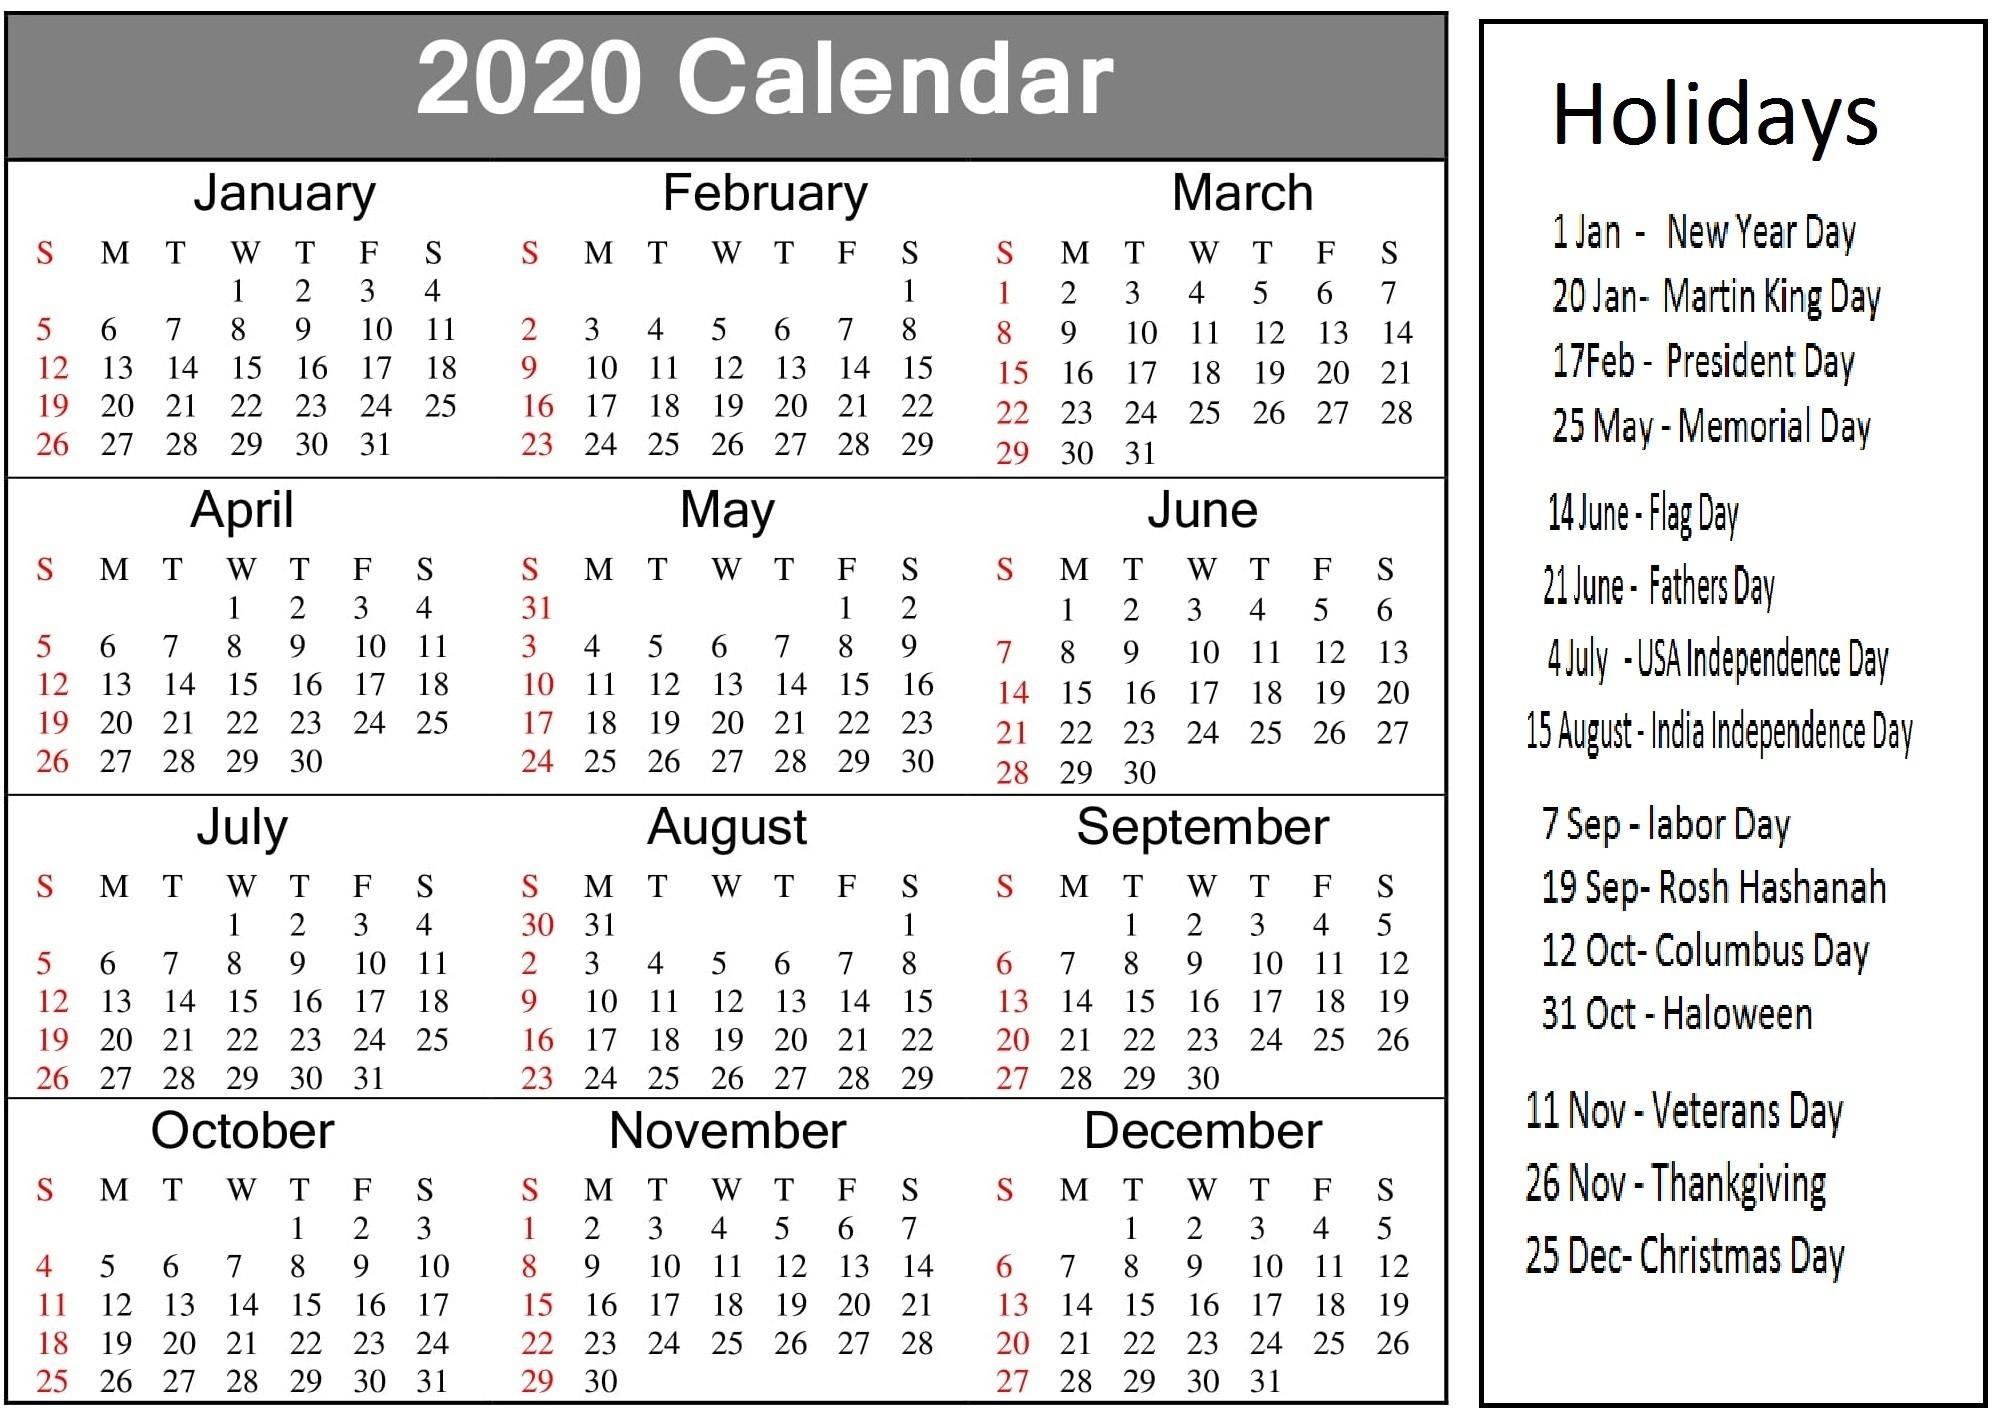 Printable 2020 Calendar With American Holidays - Latest-2020 List Of Holidays Printable